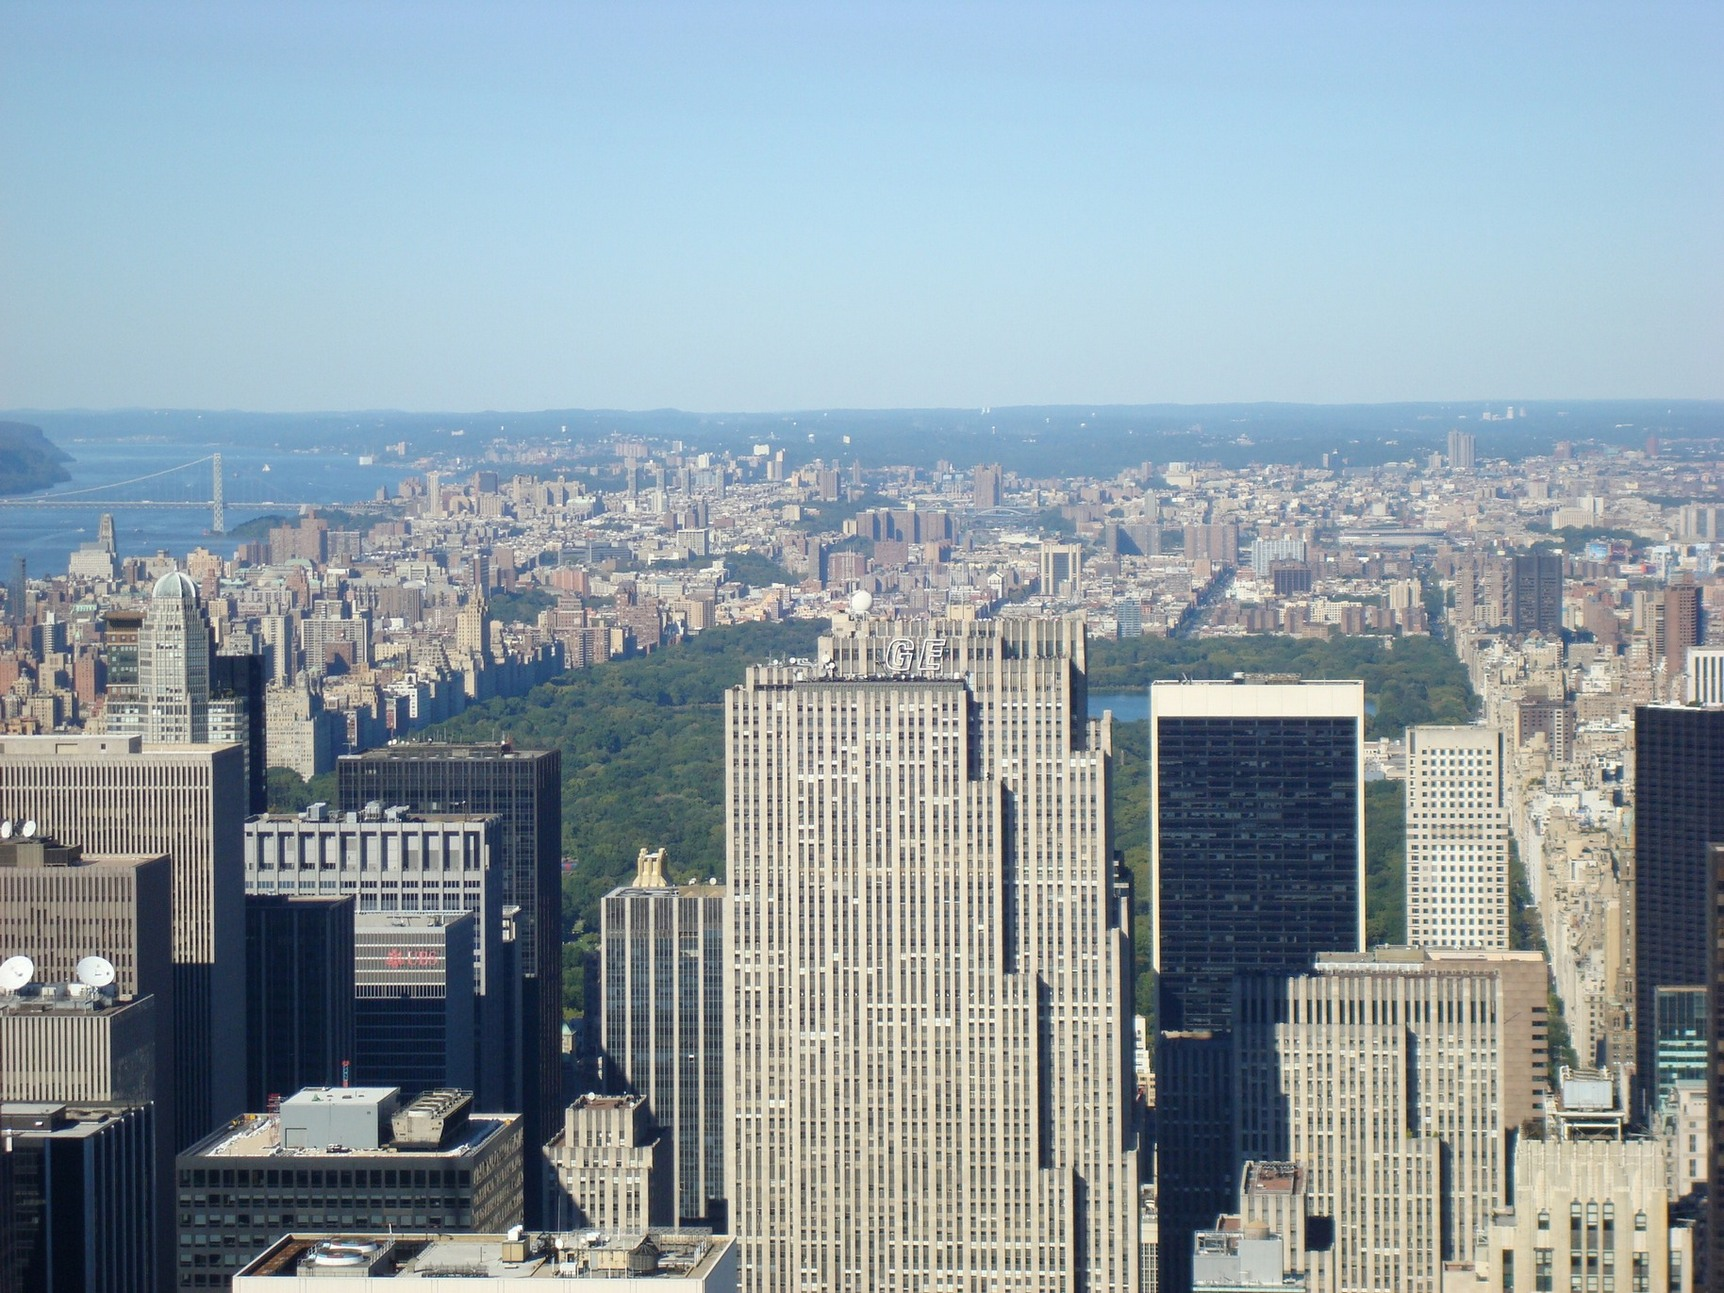 New York City_Closer shot of Central Park